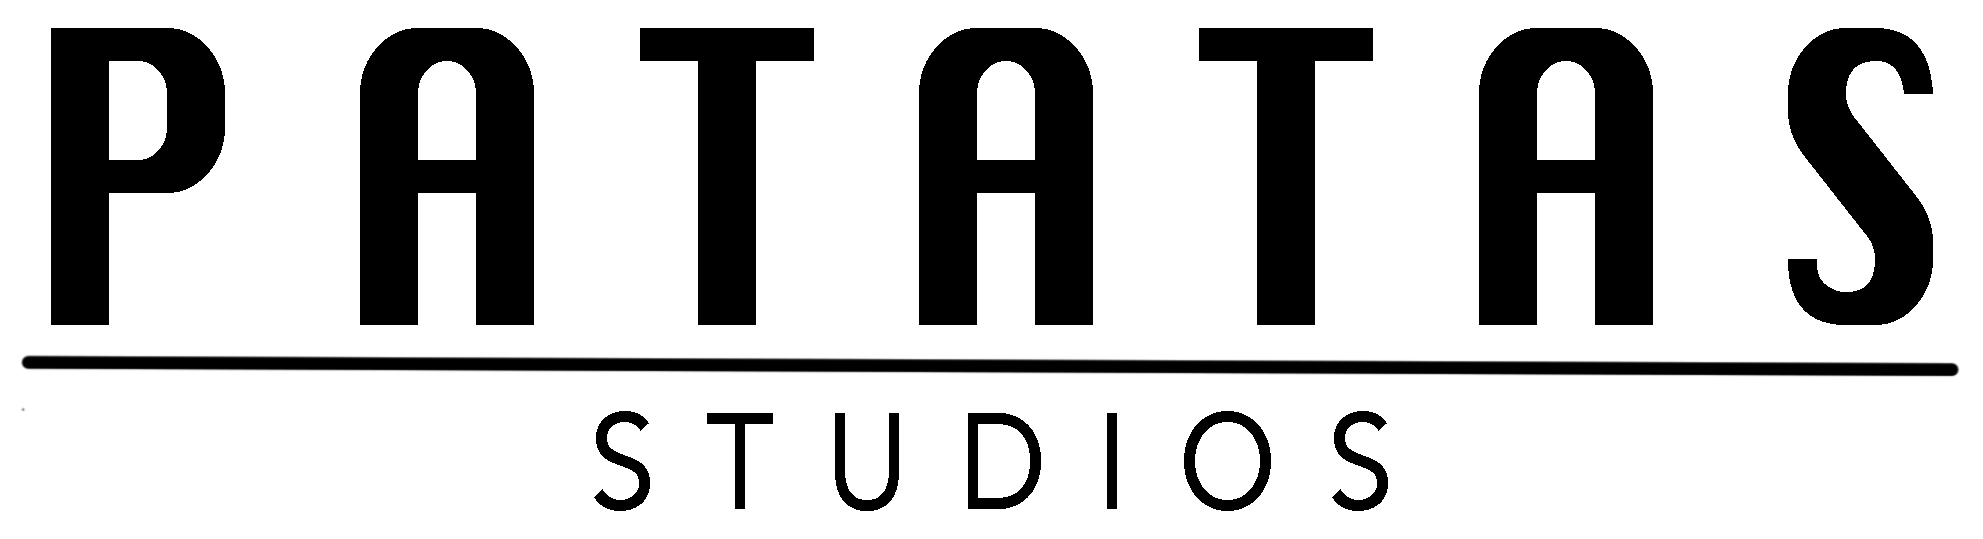 Patatas Studios | パタタス・スタジオ